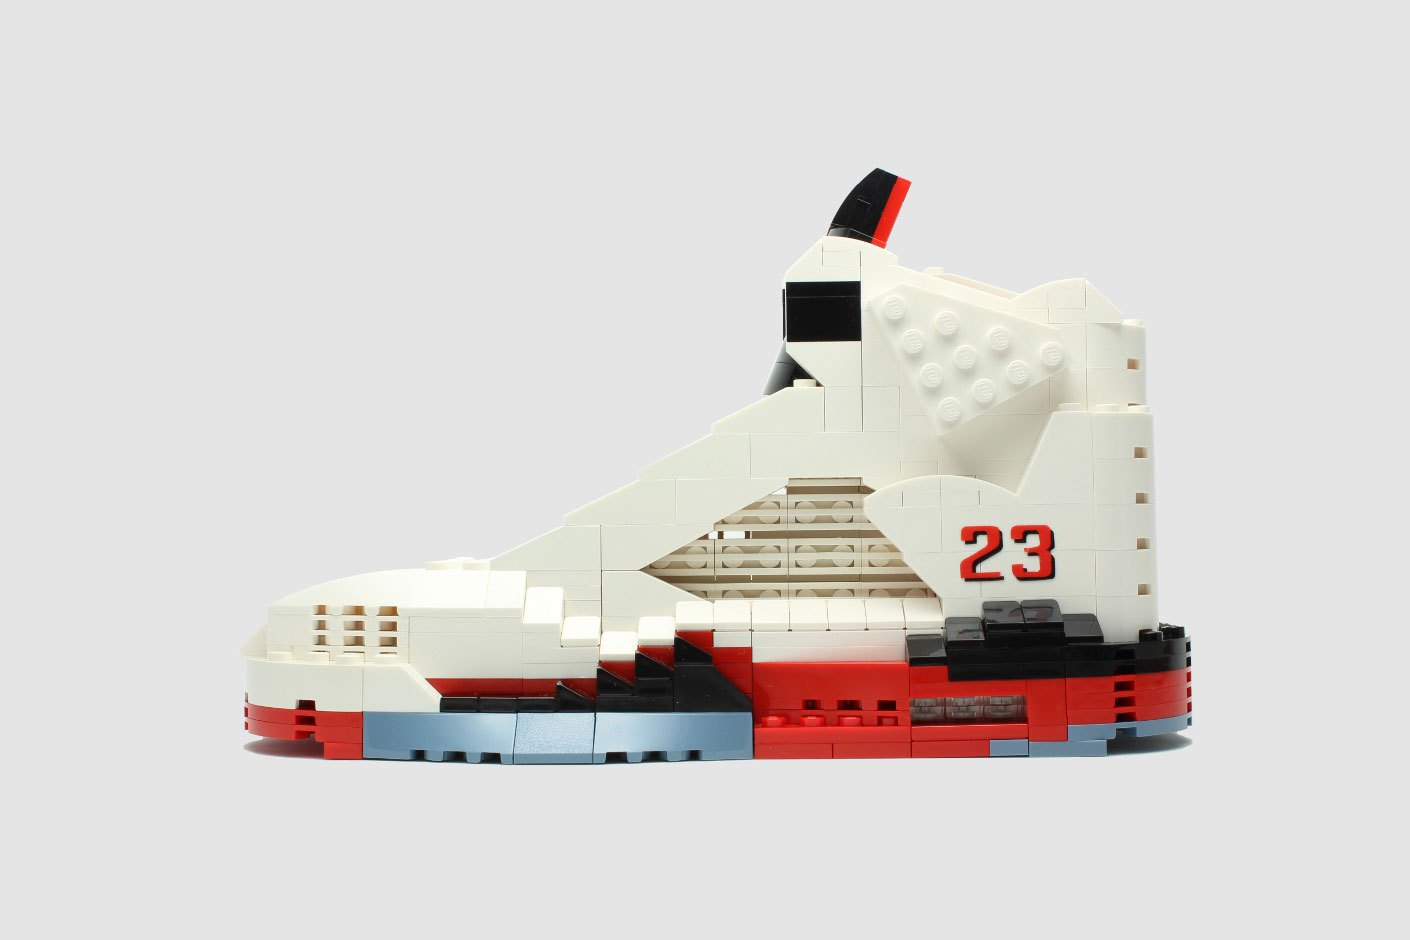 tom-yoo-lego-sneakers-333